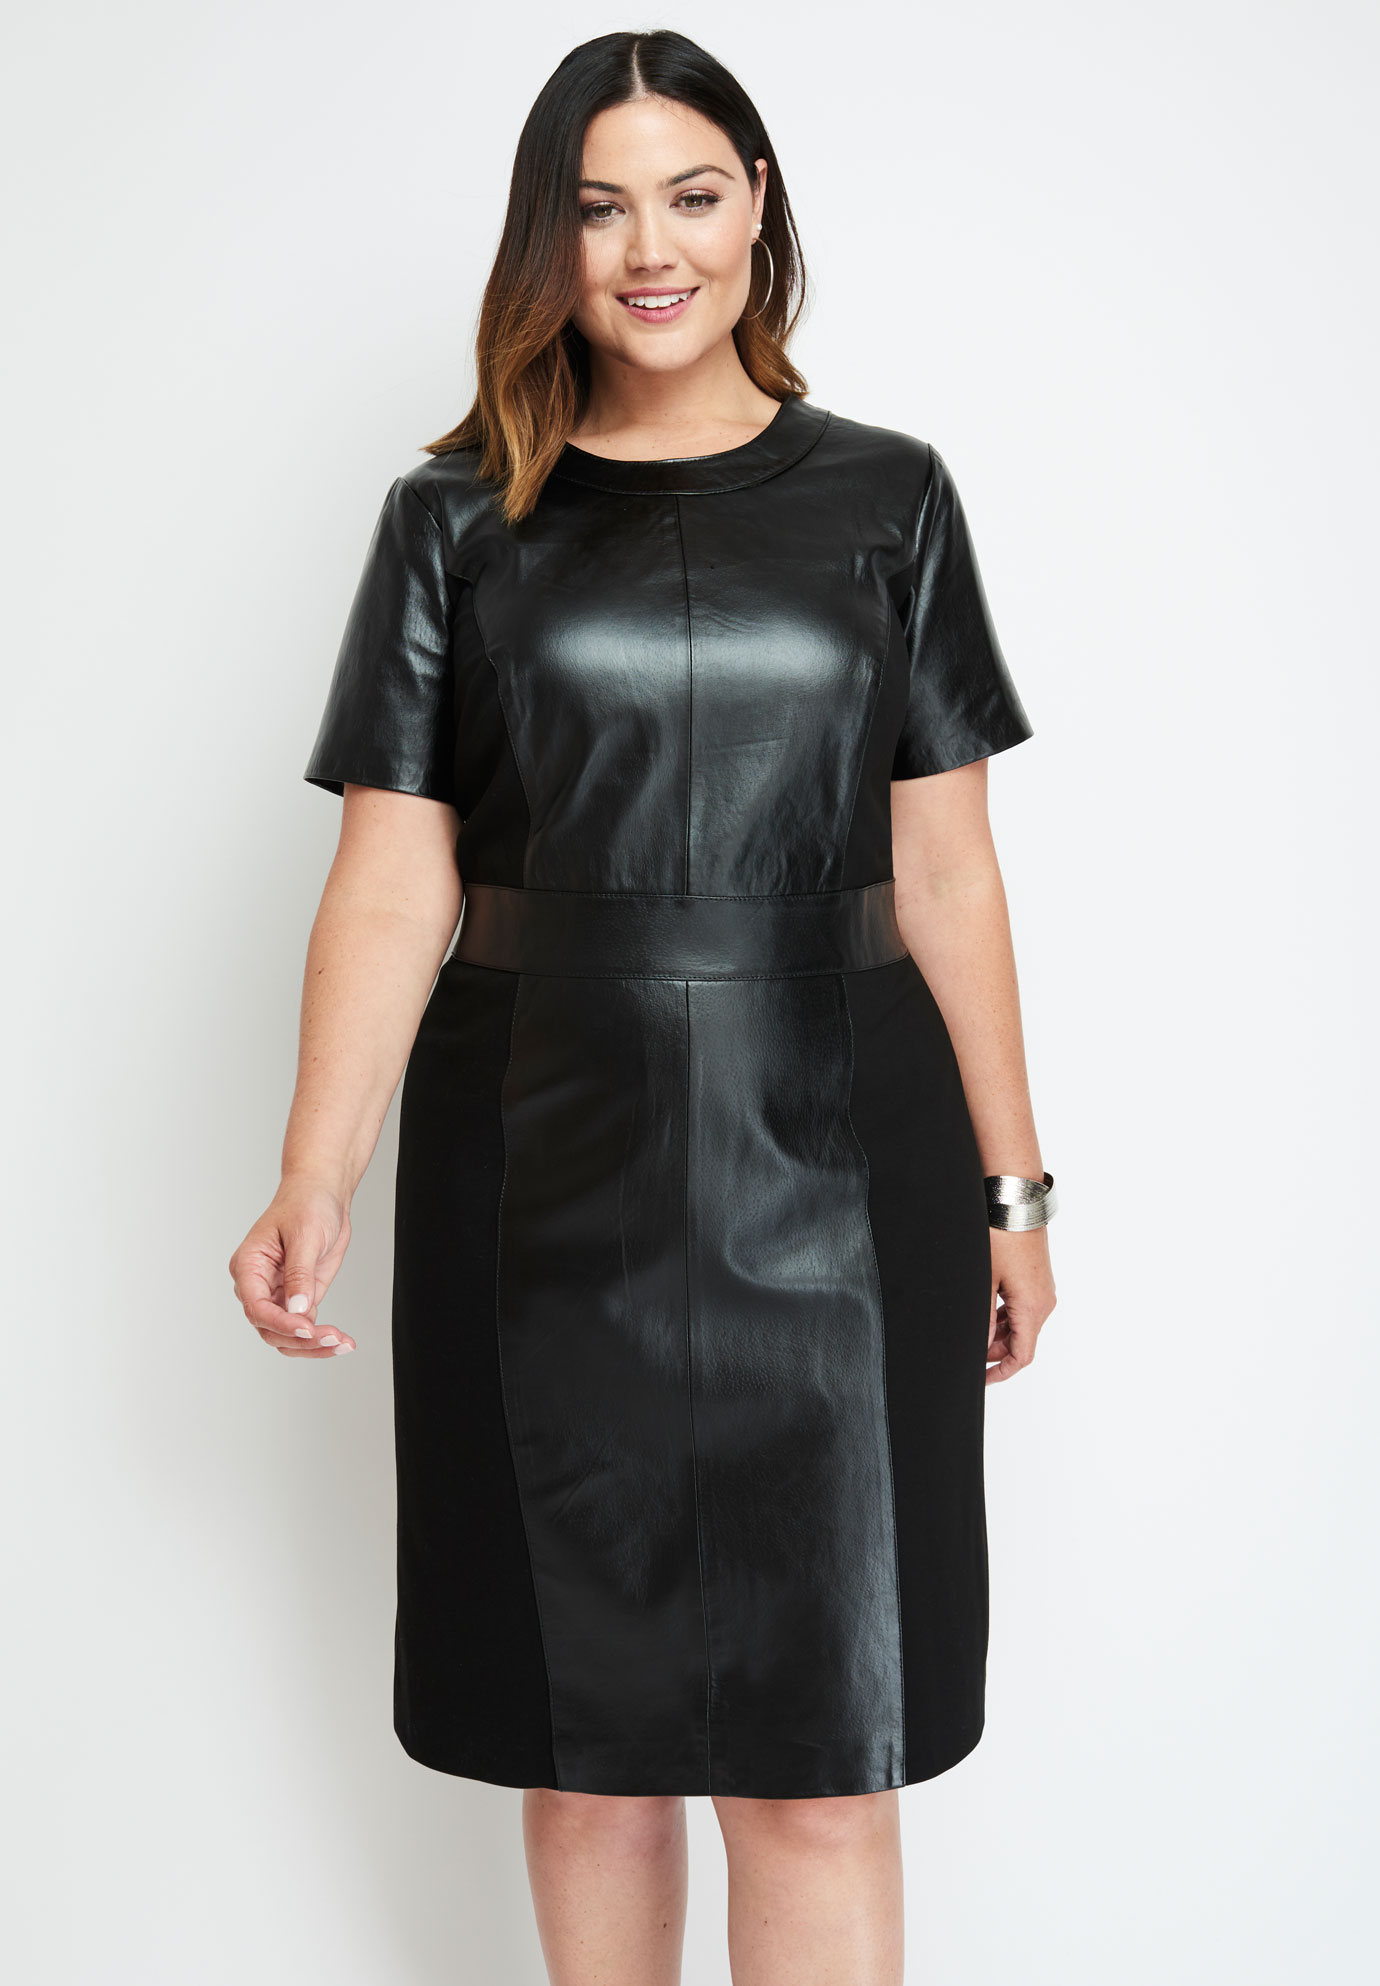 Leather Ponte Sheath Dress| Plus Size Casual Dresses | Jessica London